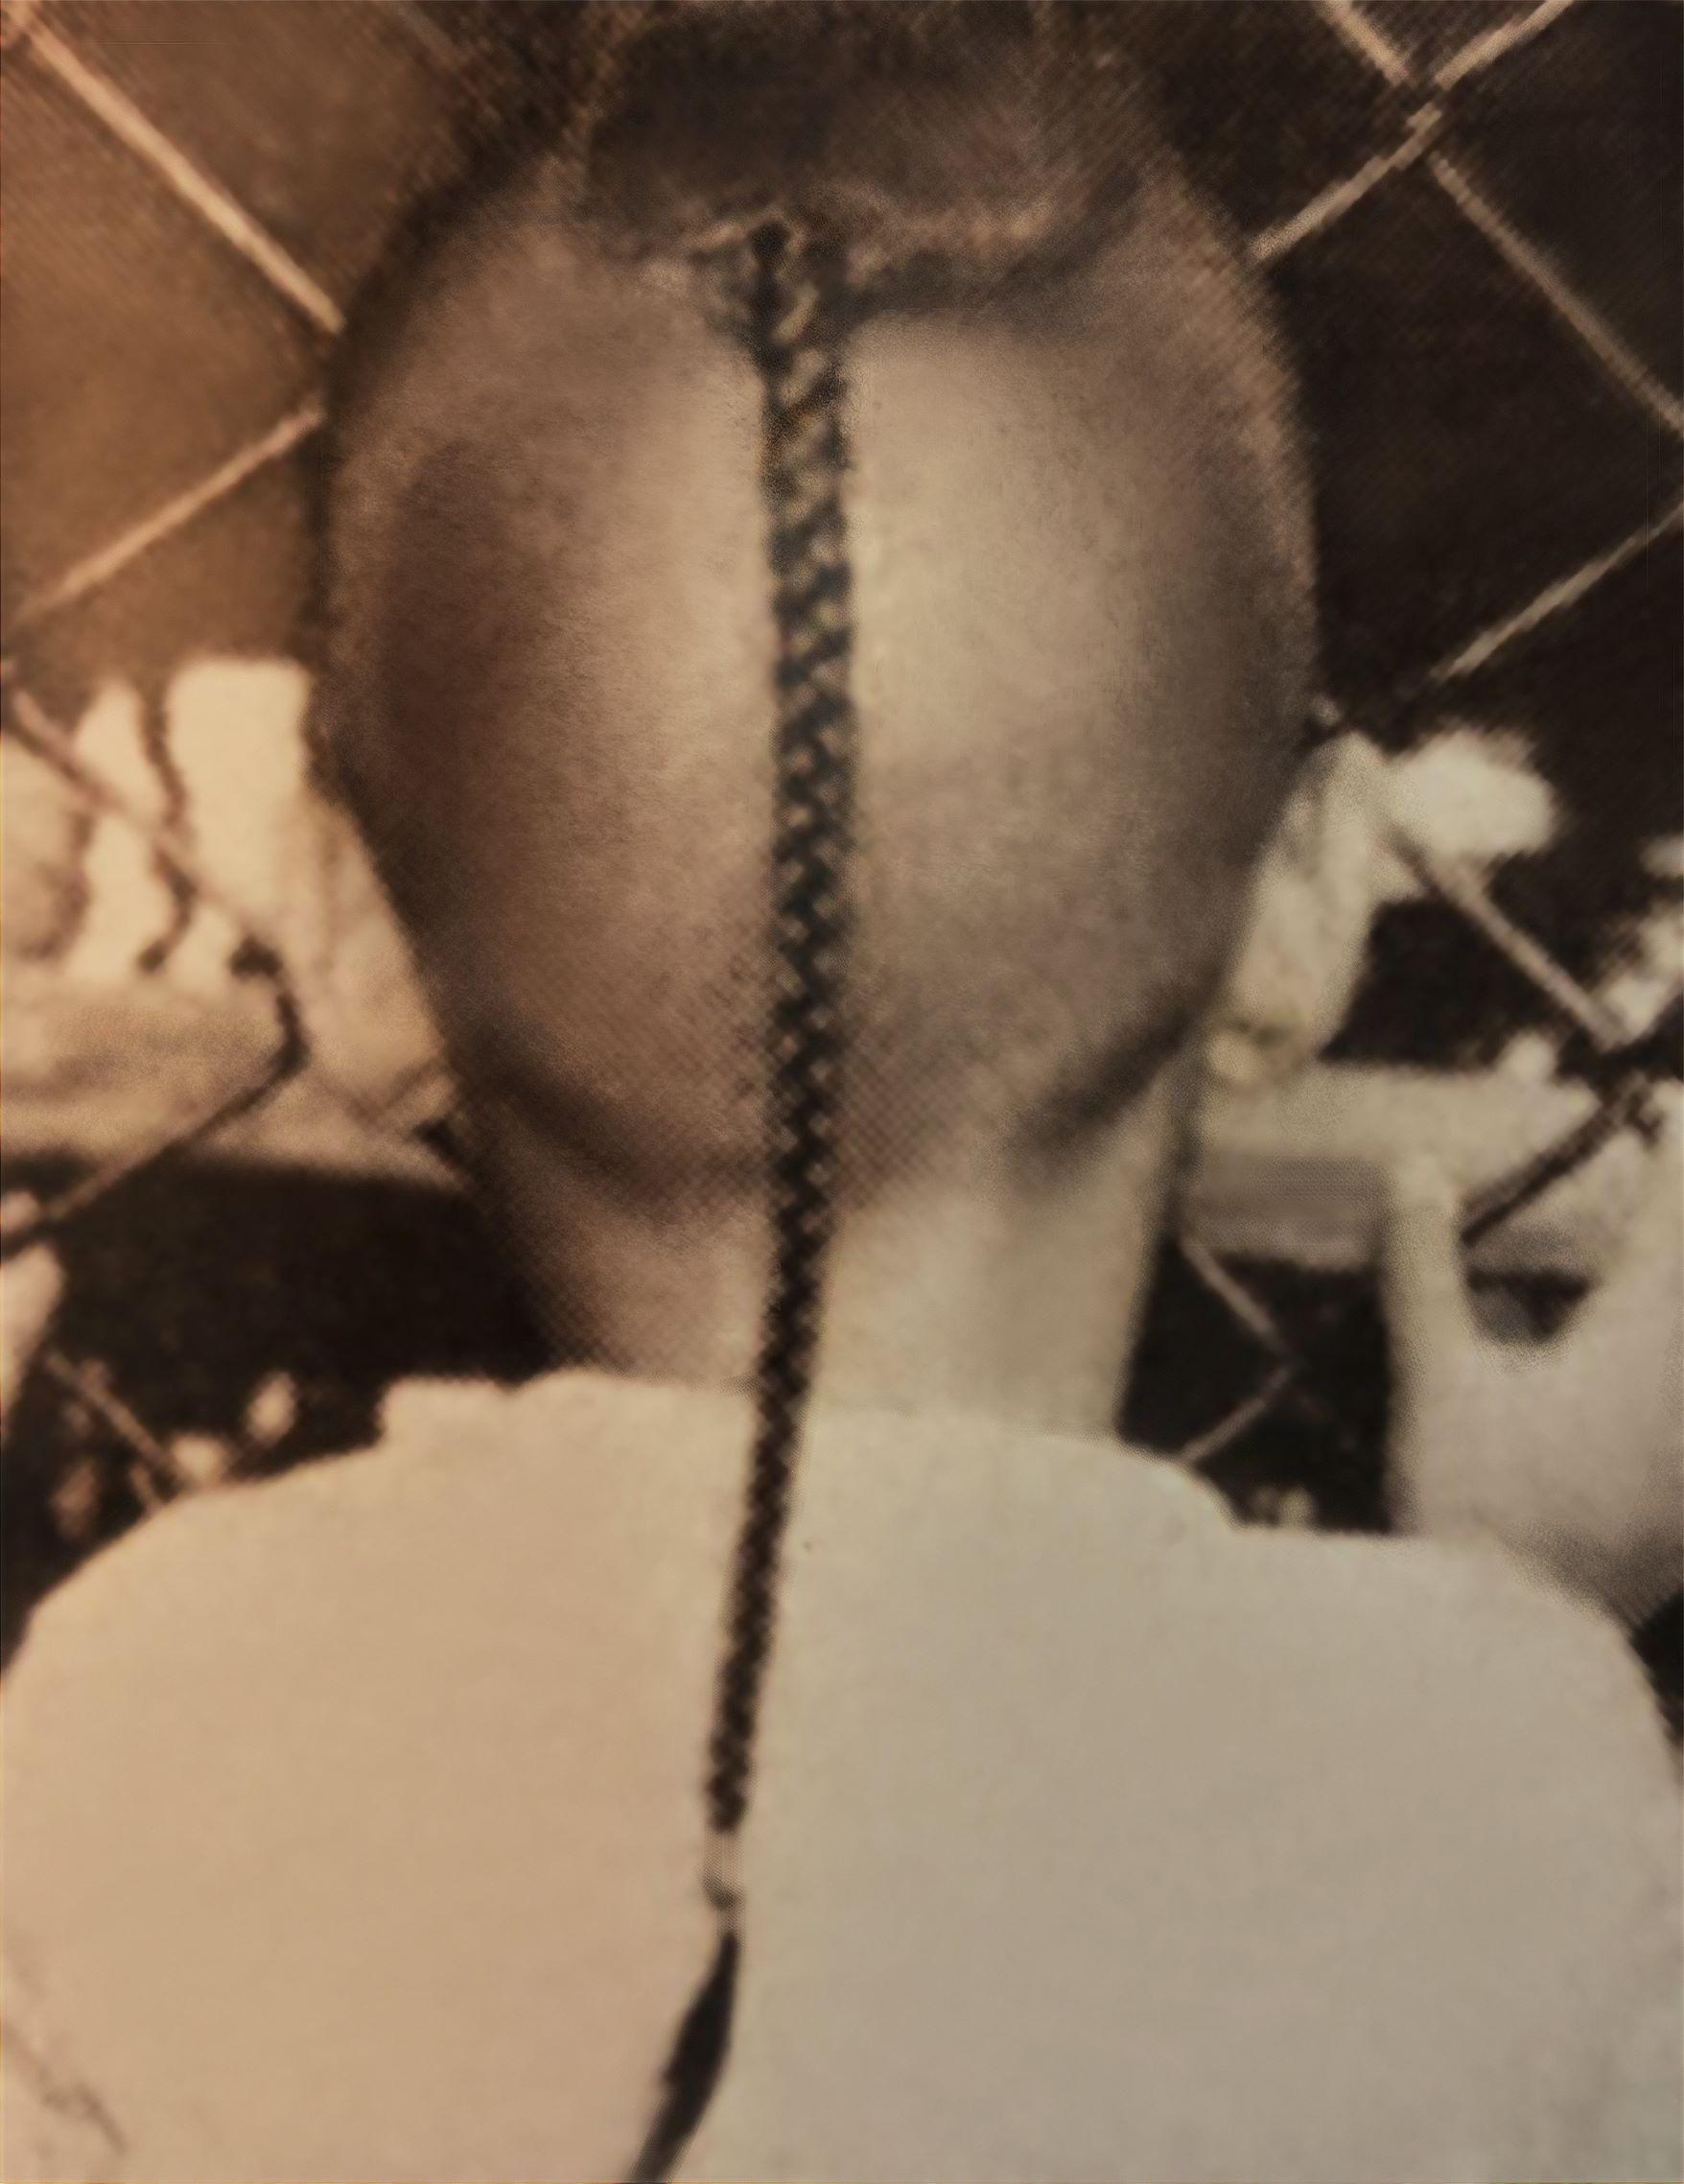 Thai Style Studio 1984 ทรงผมเด็กไทยในสมัยโบราณ / ความเชื่อกับทรงผม 13